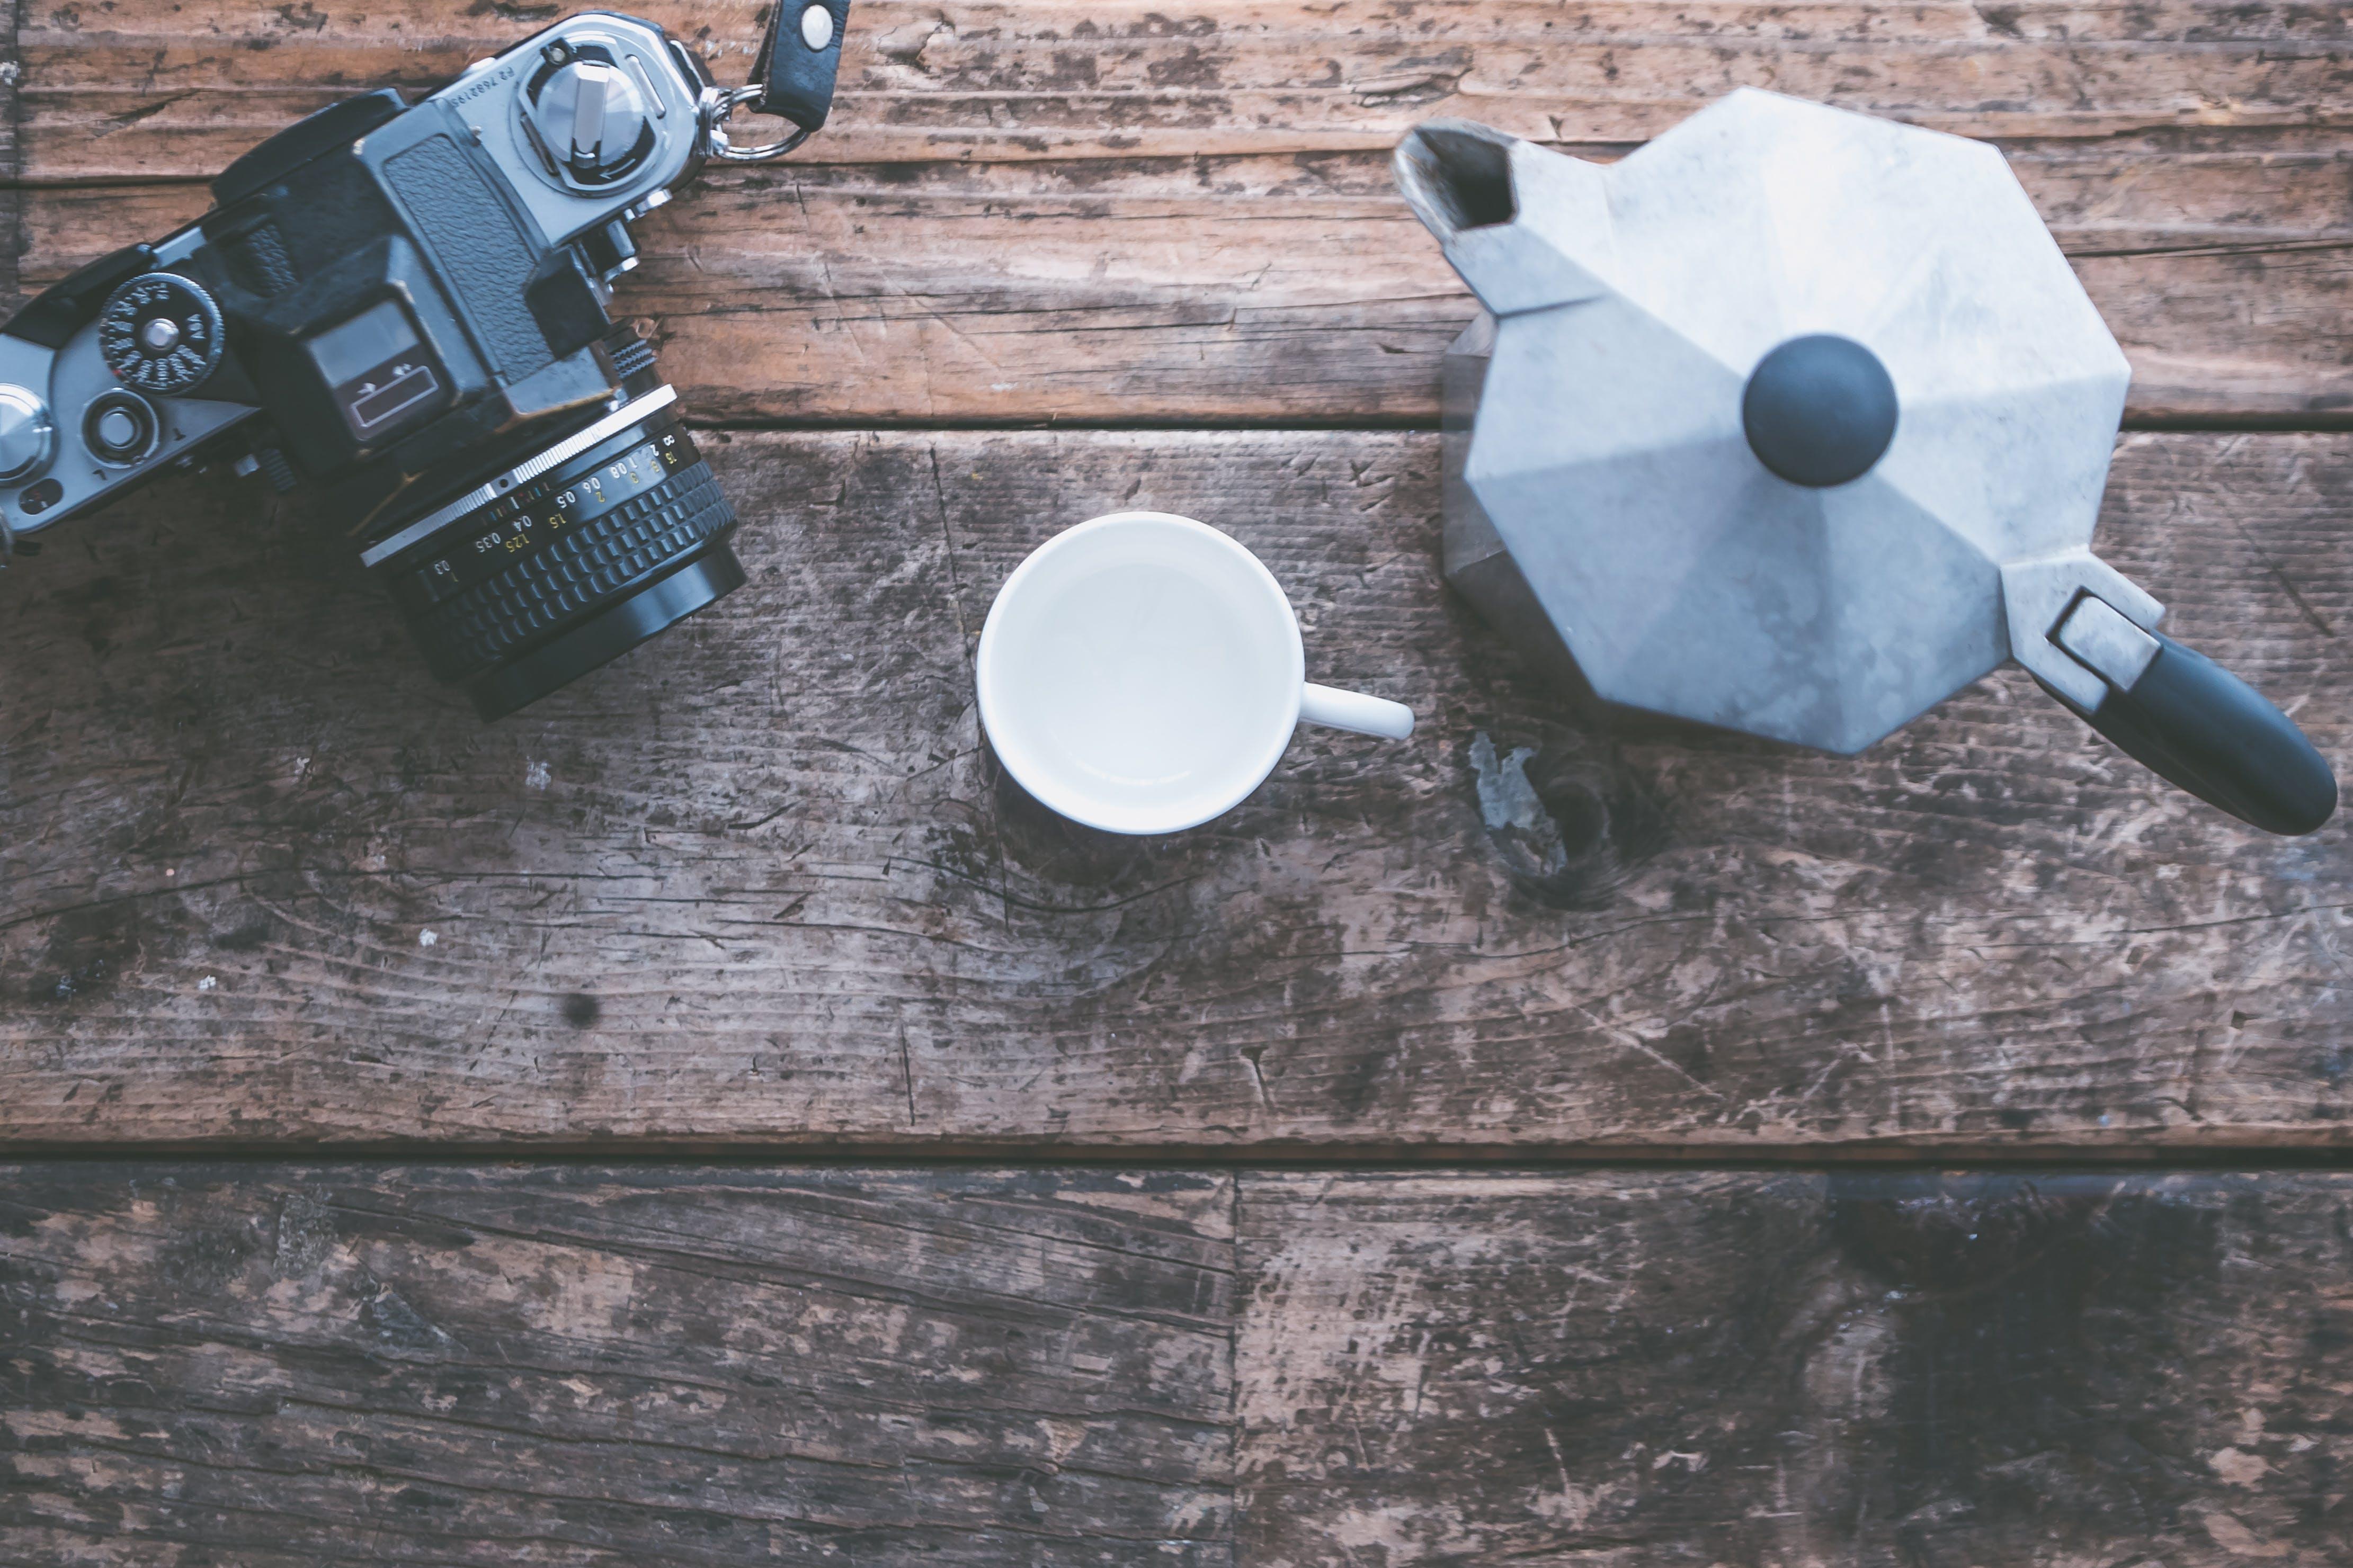 Black Slr Camera Beside White Ceramic Mug and Grey Teapot on Brown Wooden Table